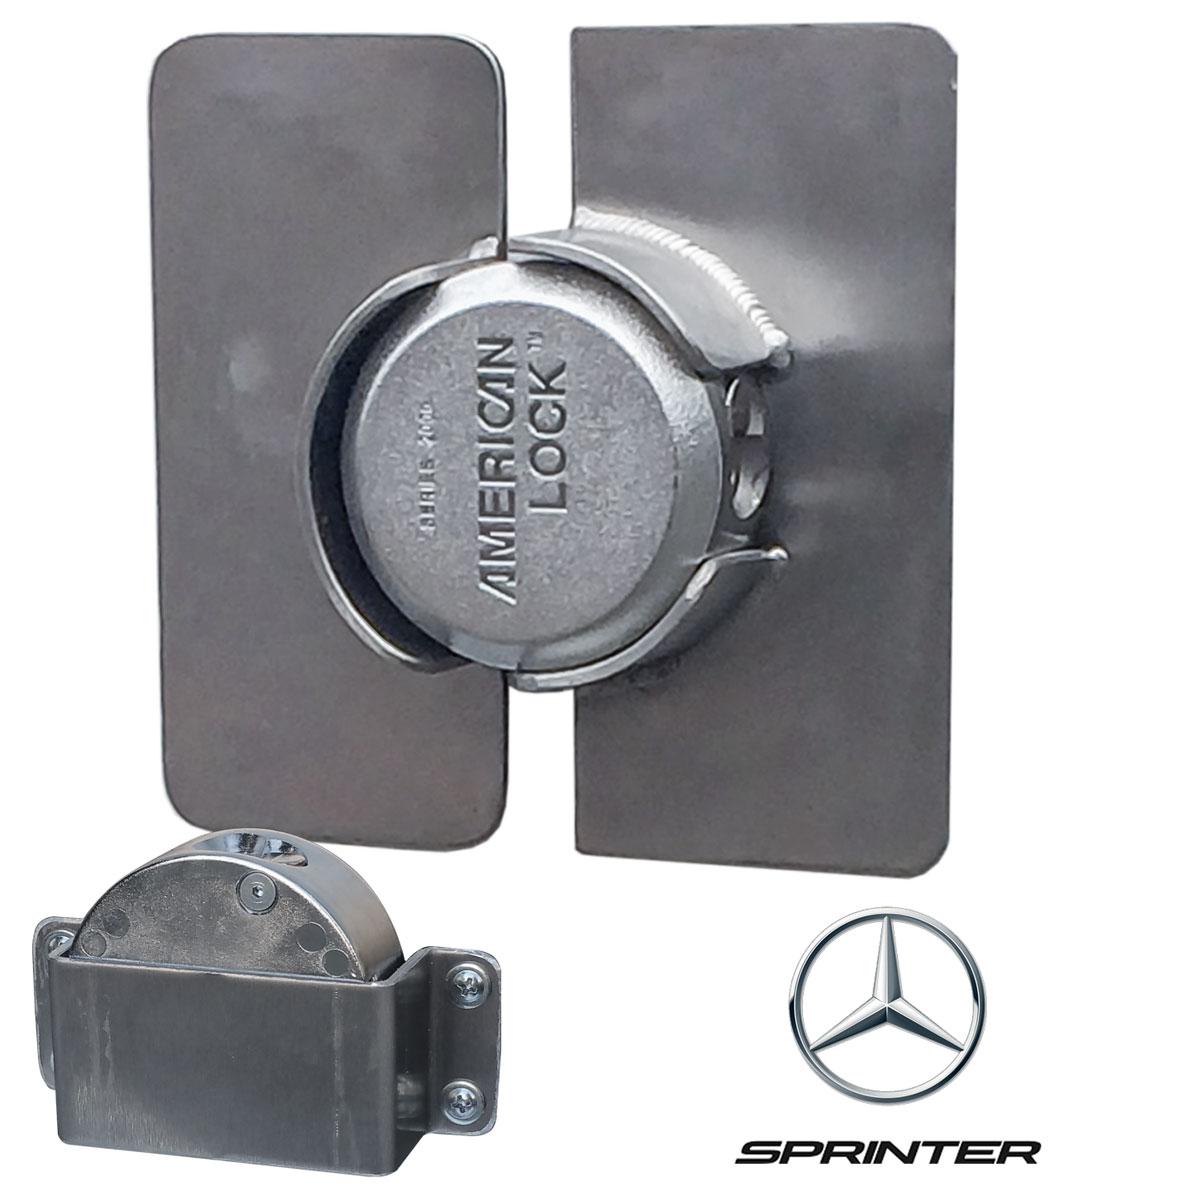 2007 to 2018 SprinterPuck Lock Kit Rear DoorSKU: 170001